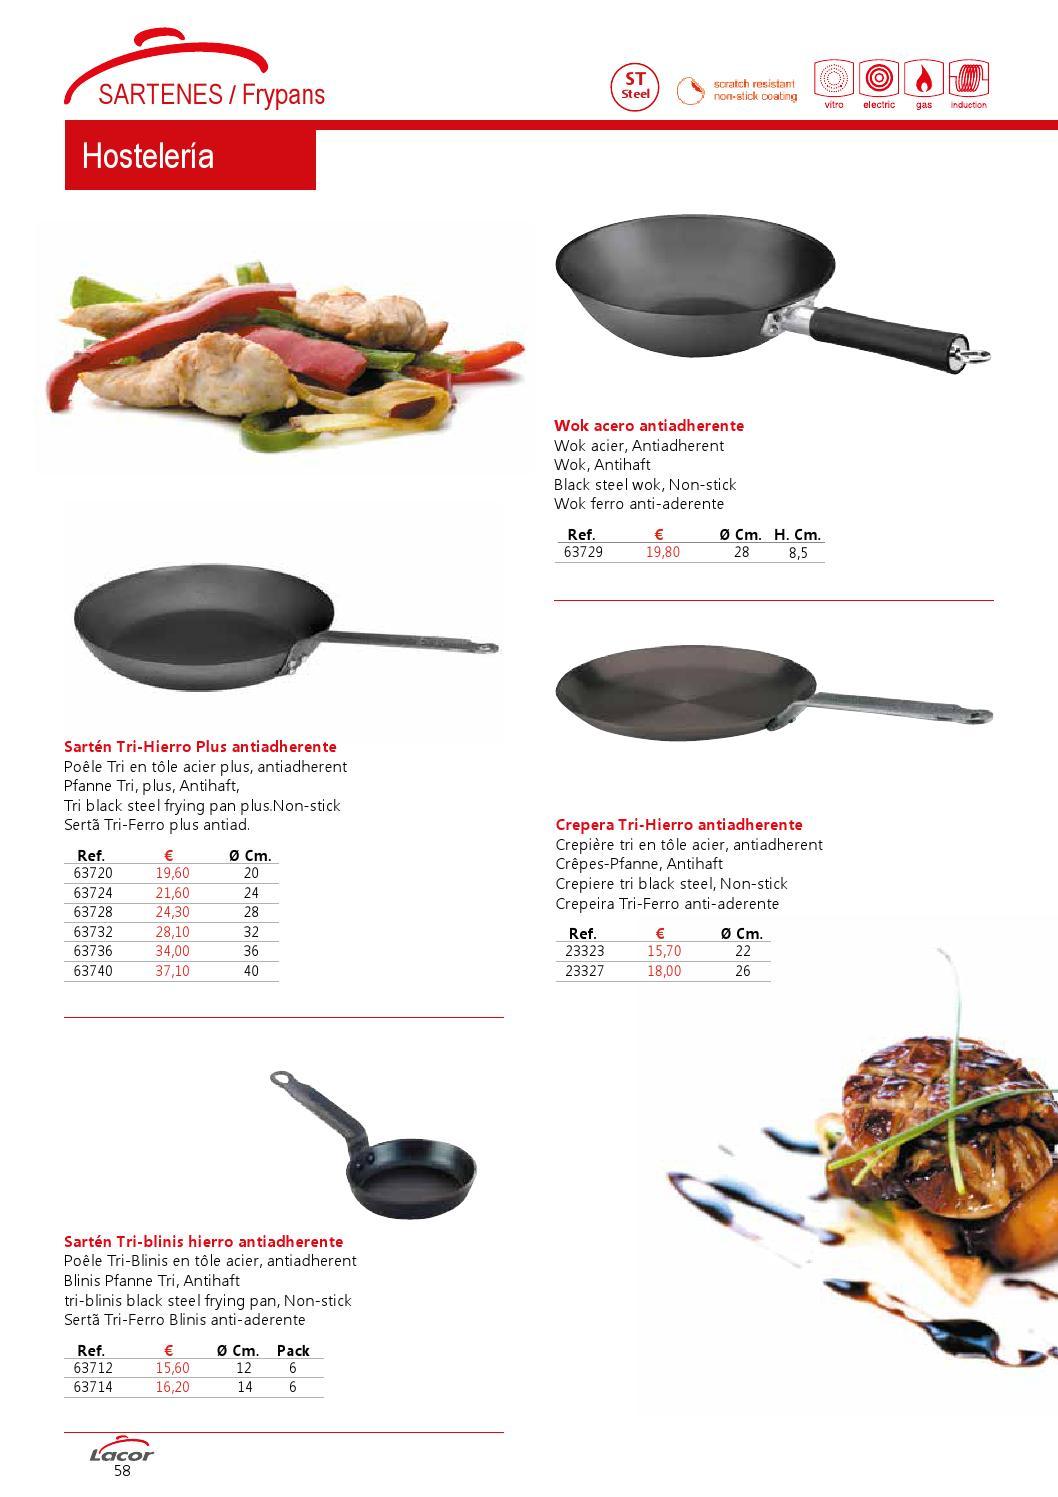 Cocina Lacor Catalogo General Domestico By Grupo Flashback Issuu